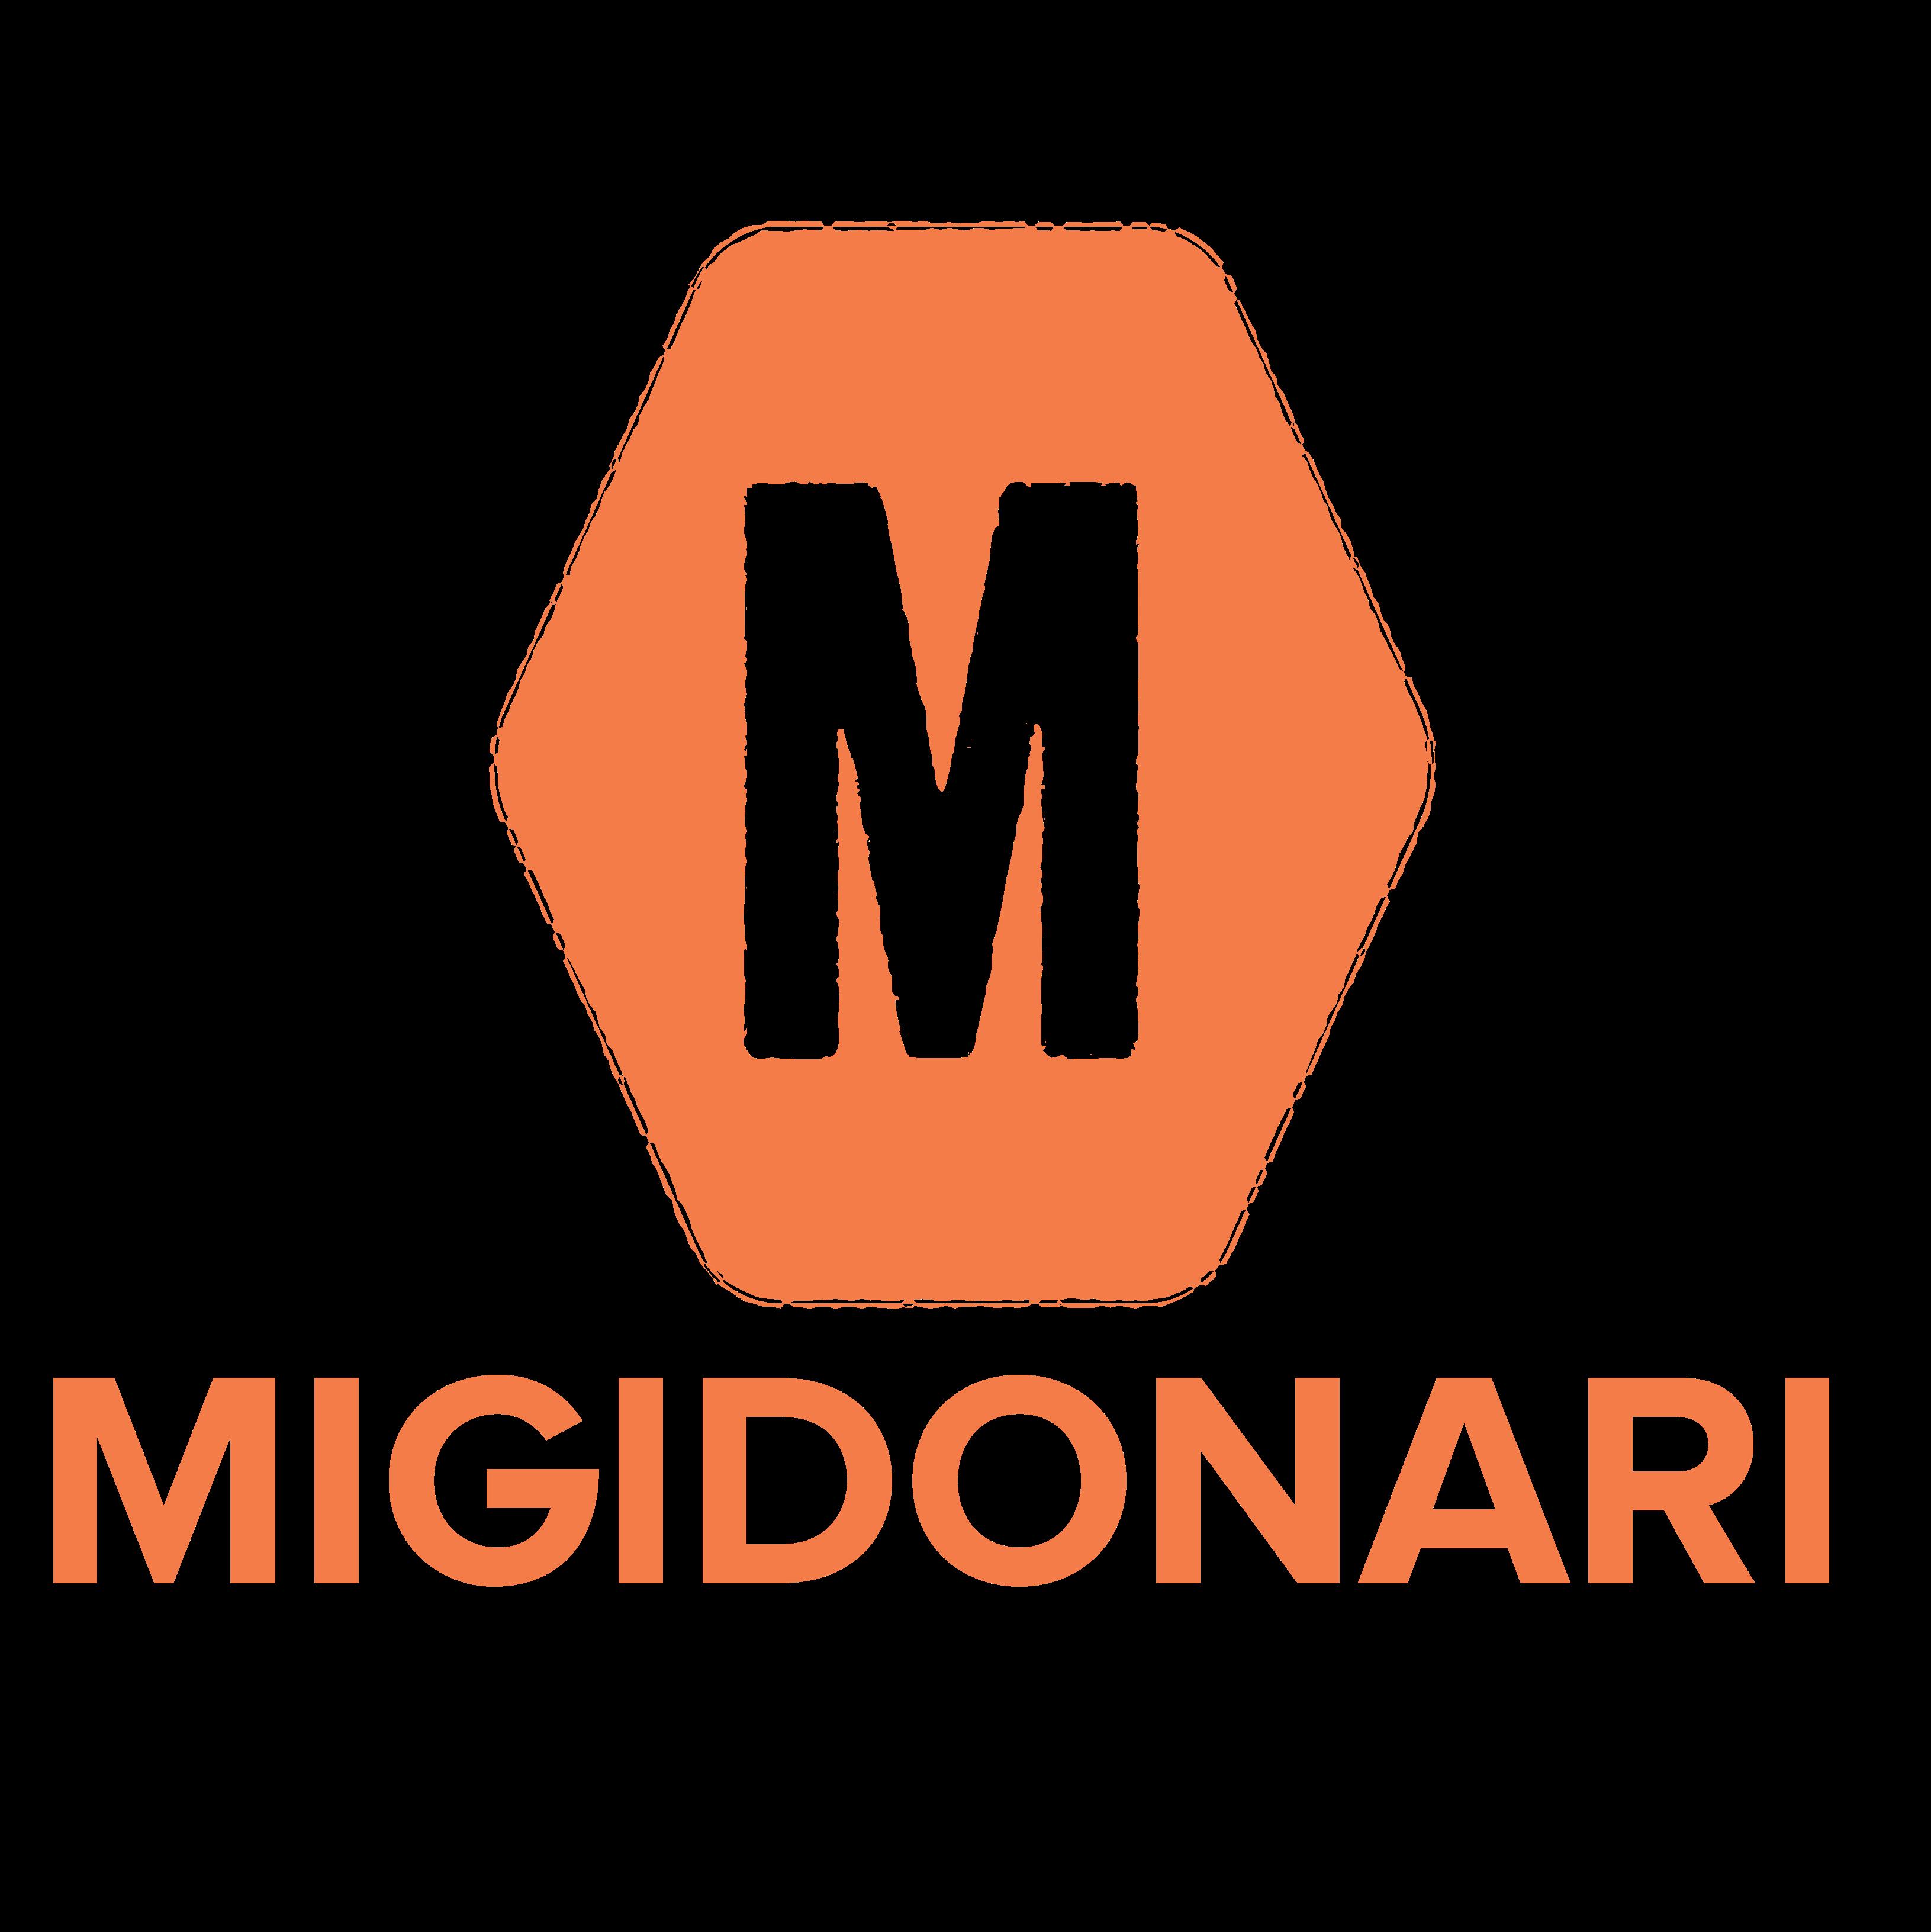 Migidonari official logo %e7%b8%a6%e6%a8%aa%e6%af%941x1 y